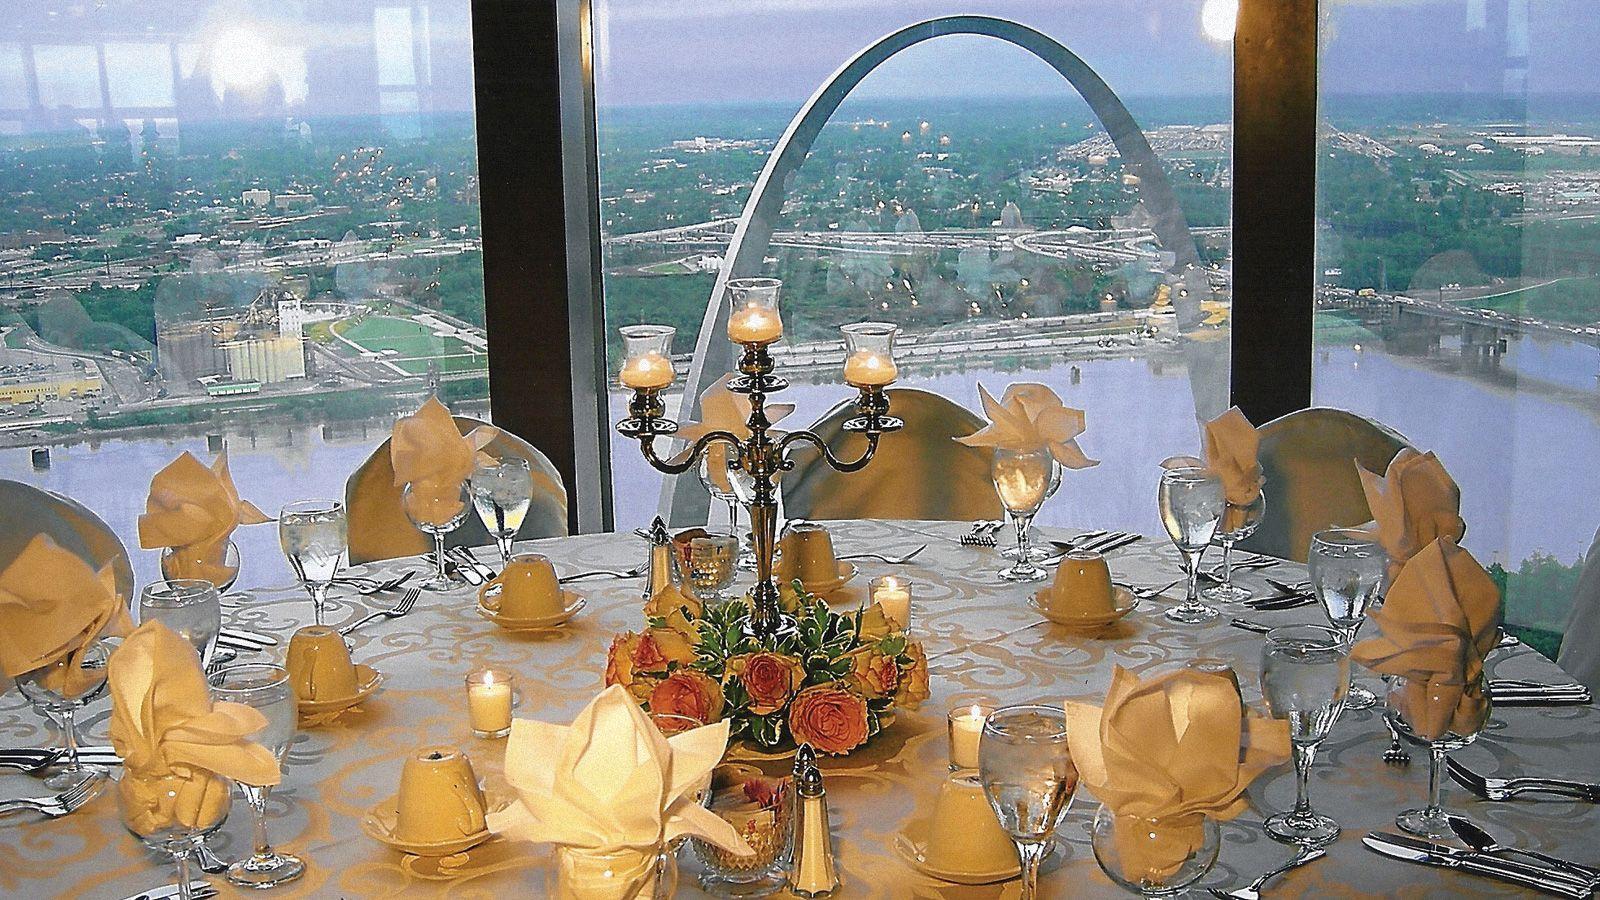 Kemoll S Makes 100 Most Scenic Restaurants In America List St Louis Mo